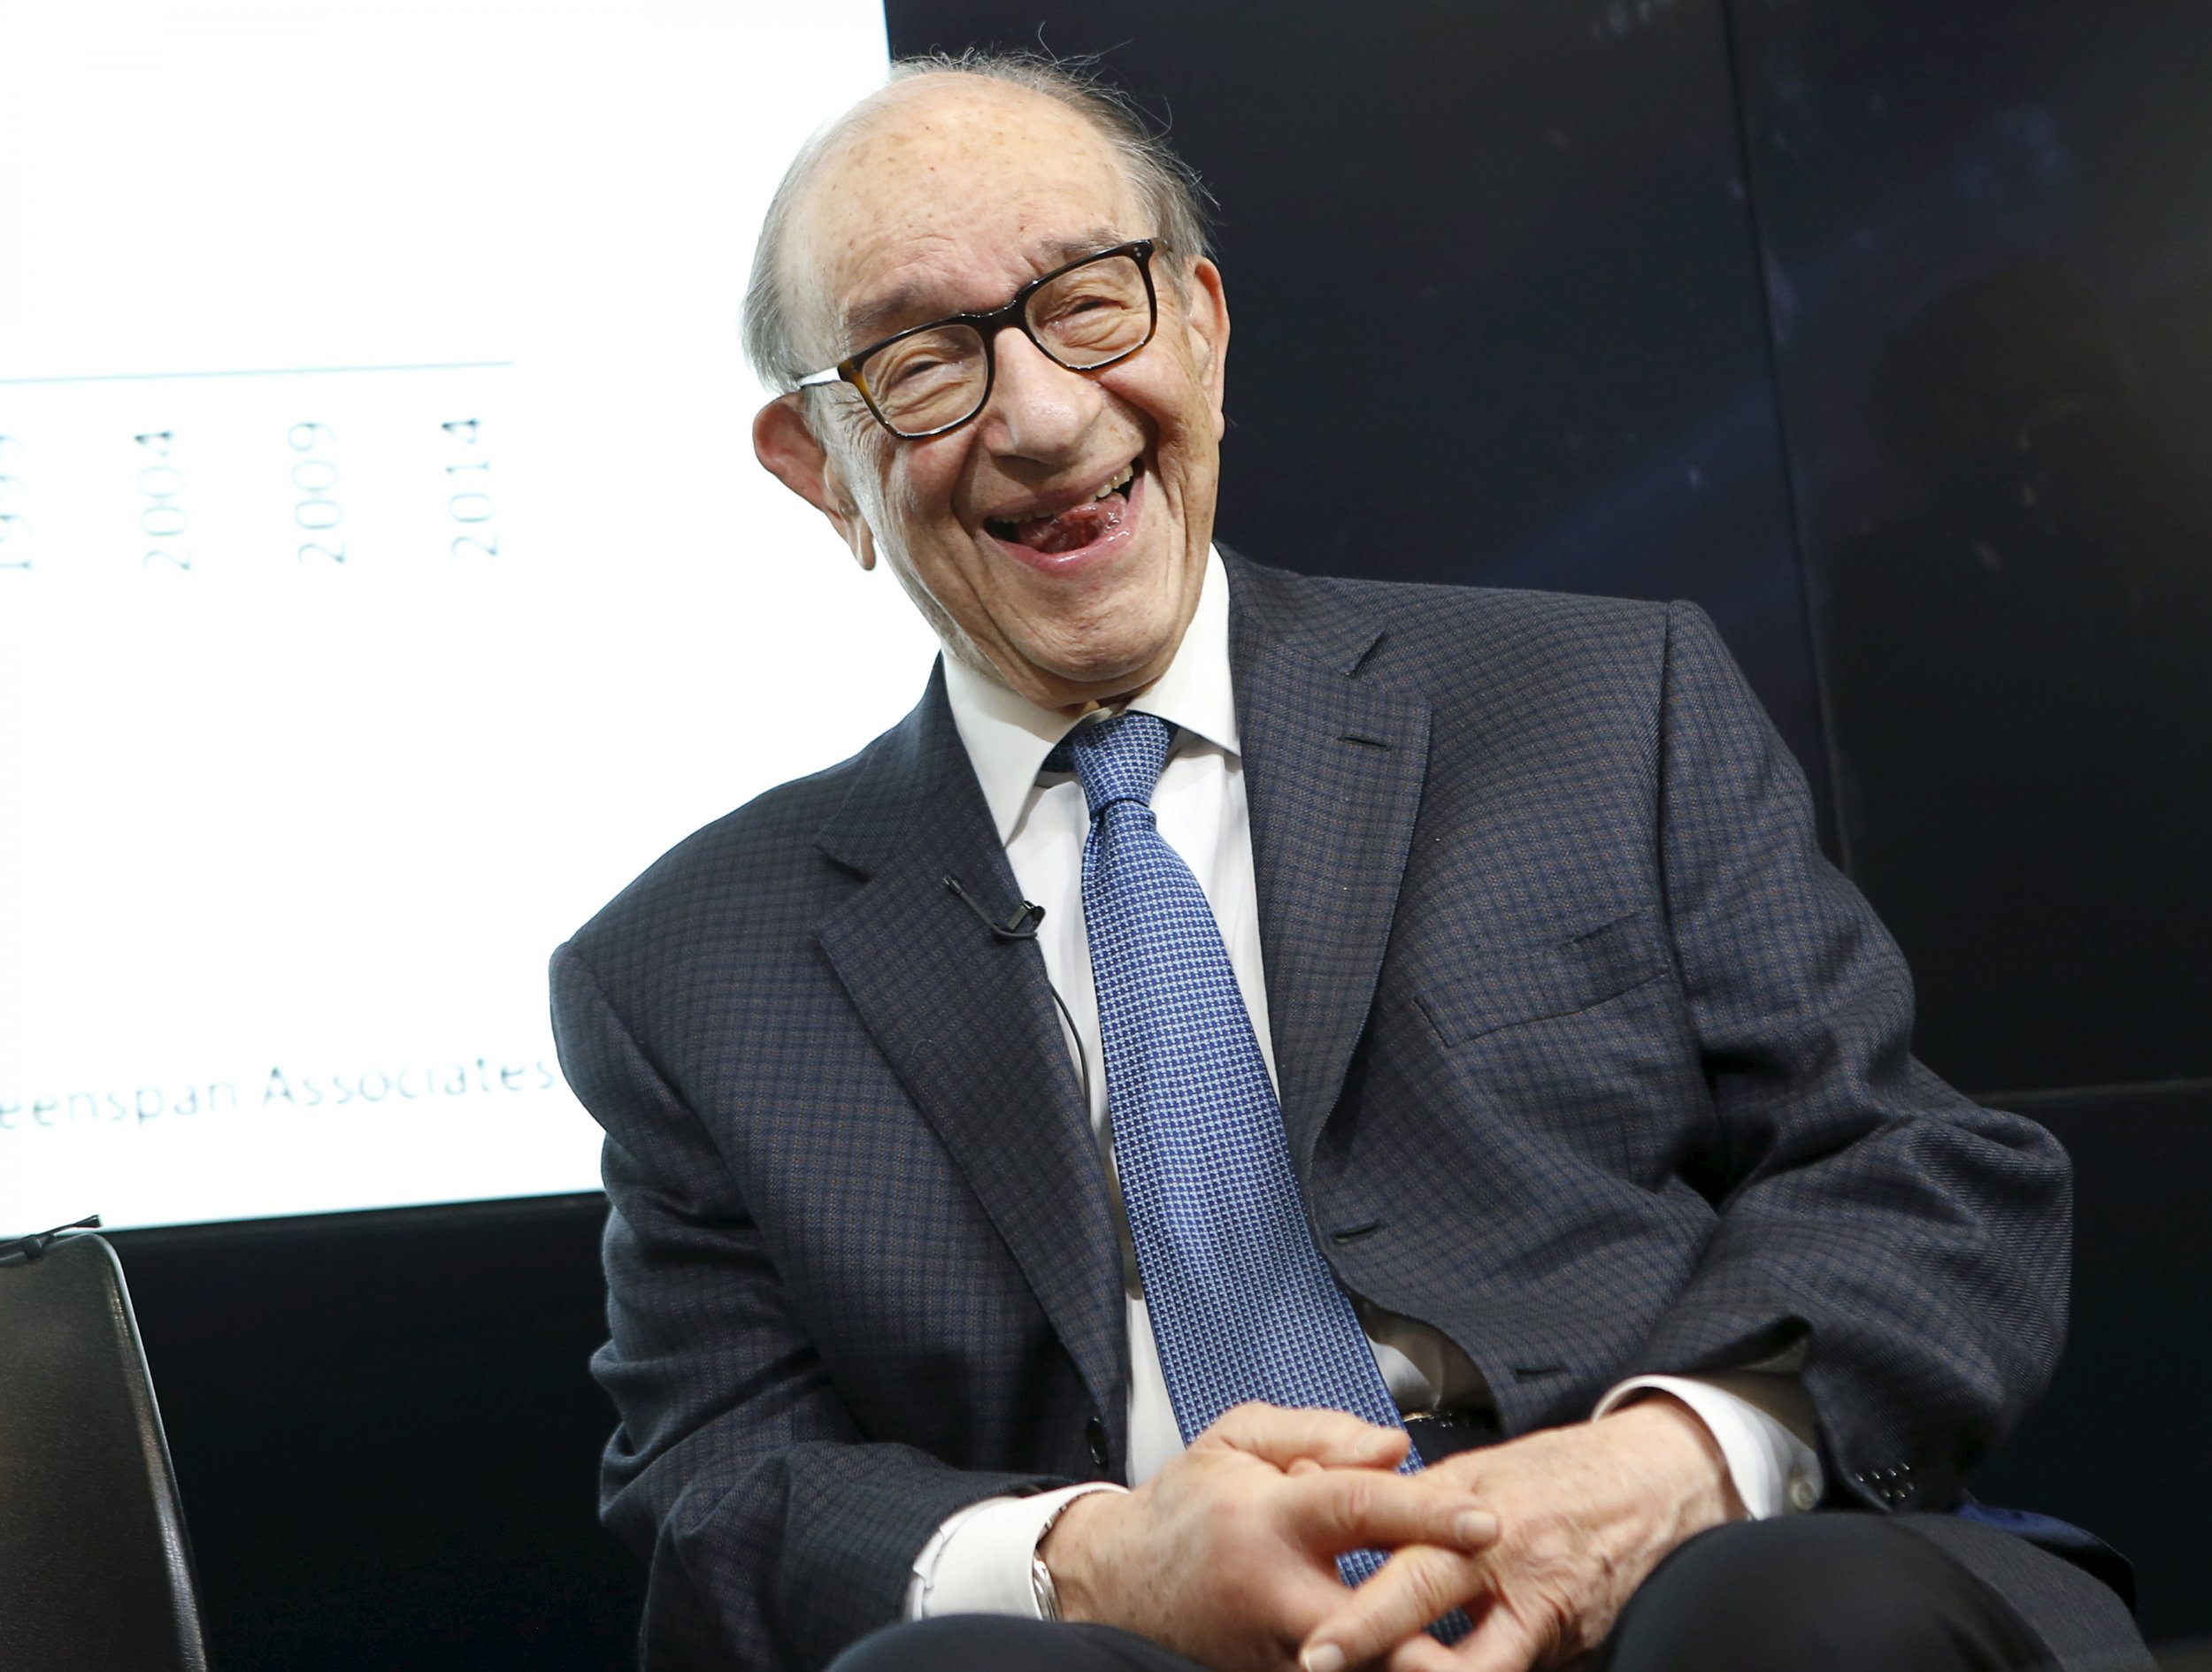 07_16_Greenspan_Debt_01